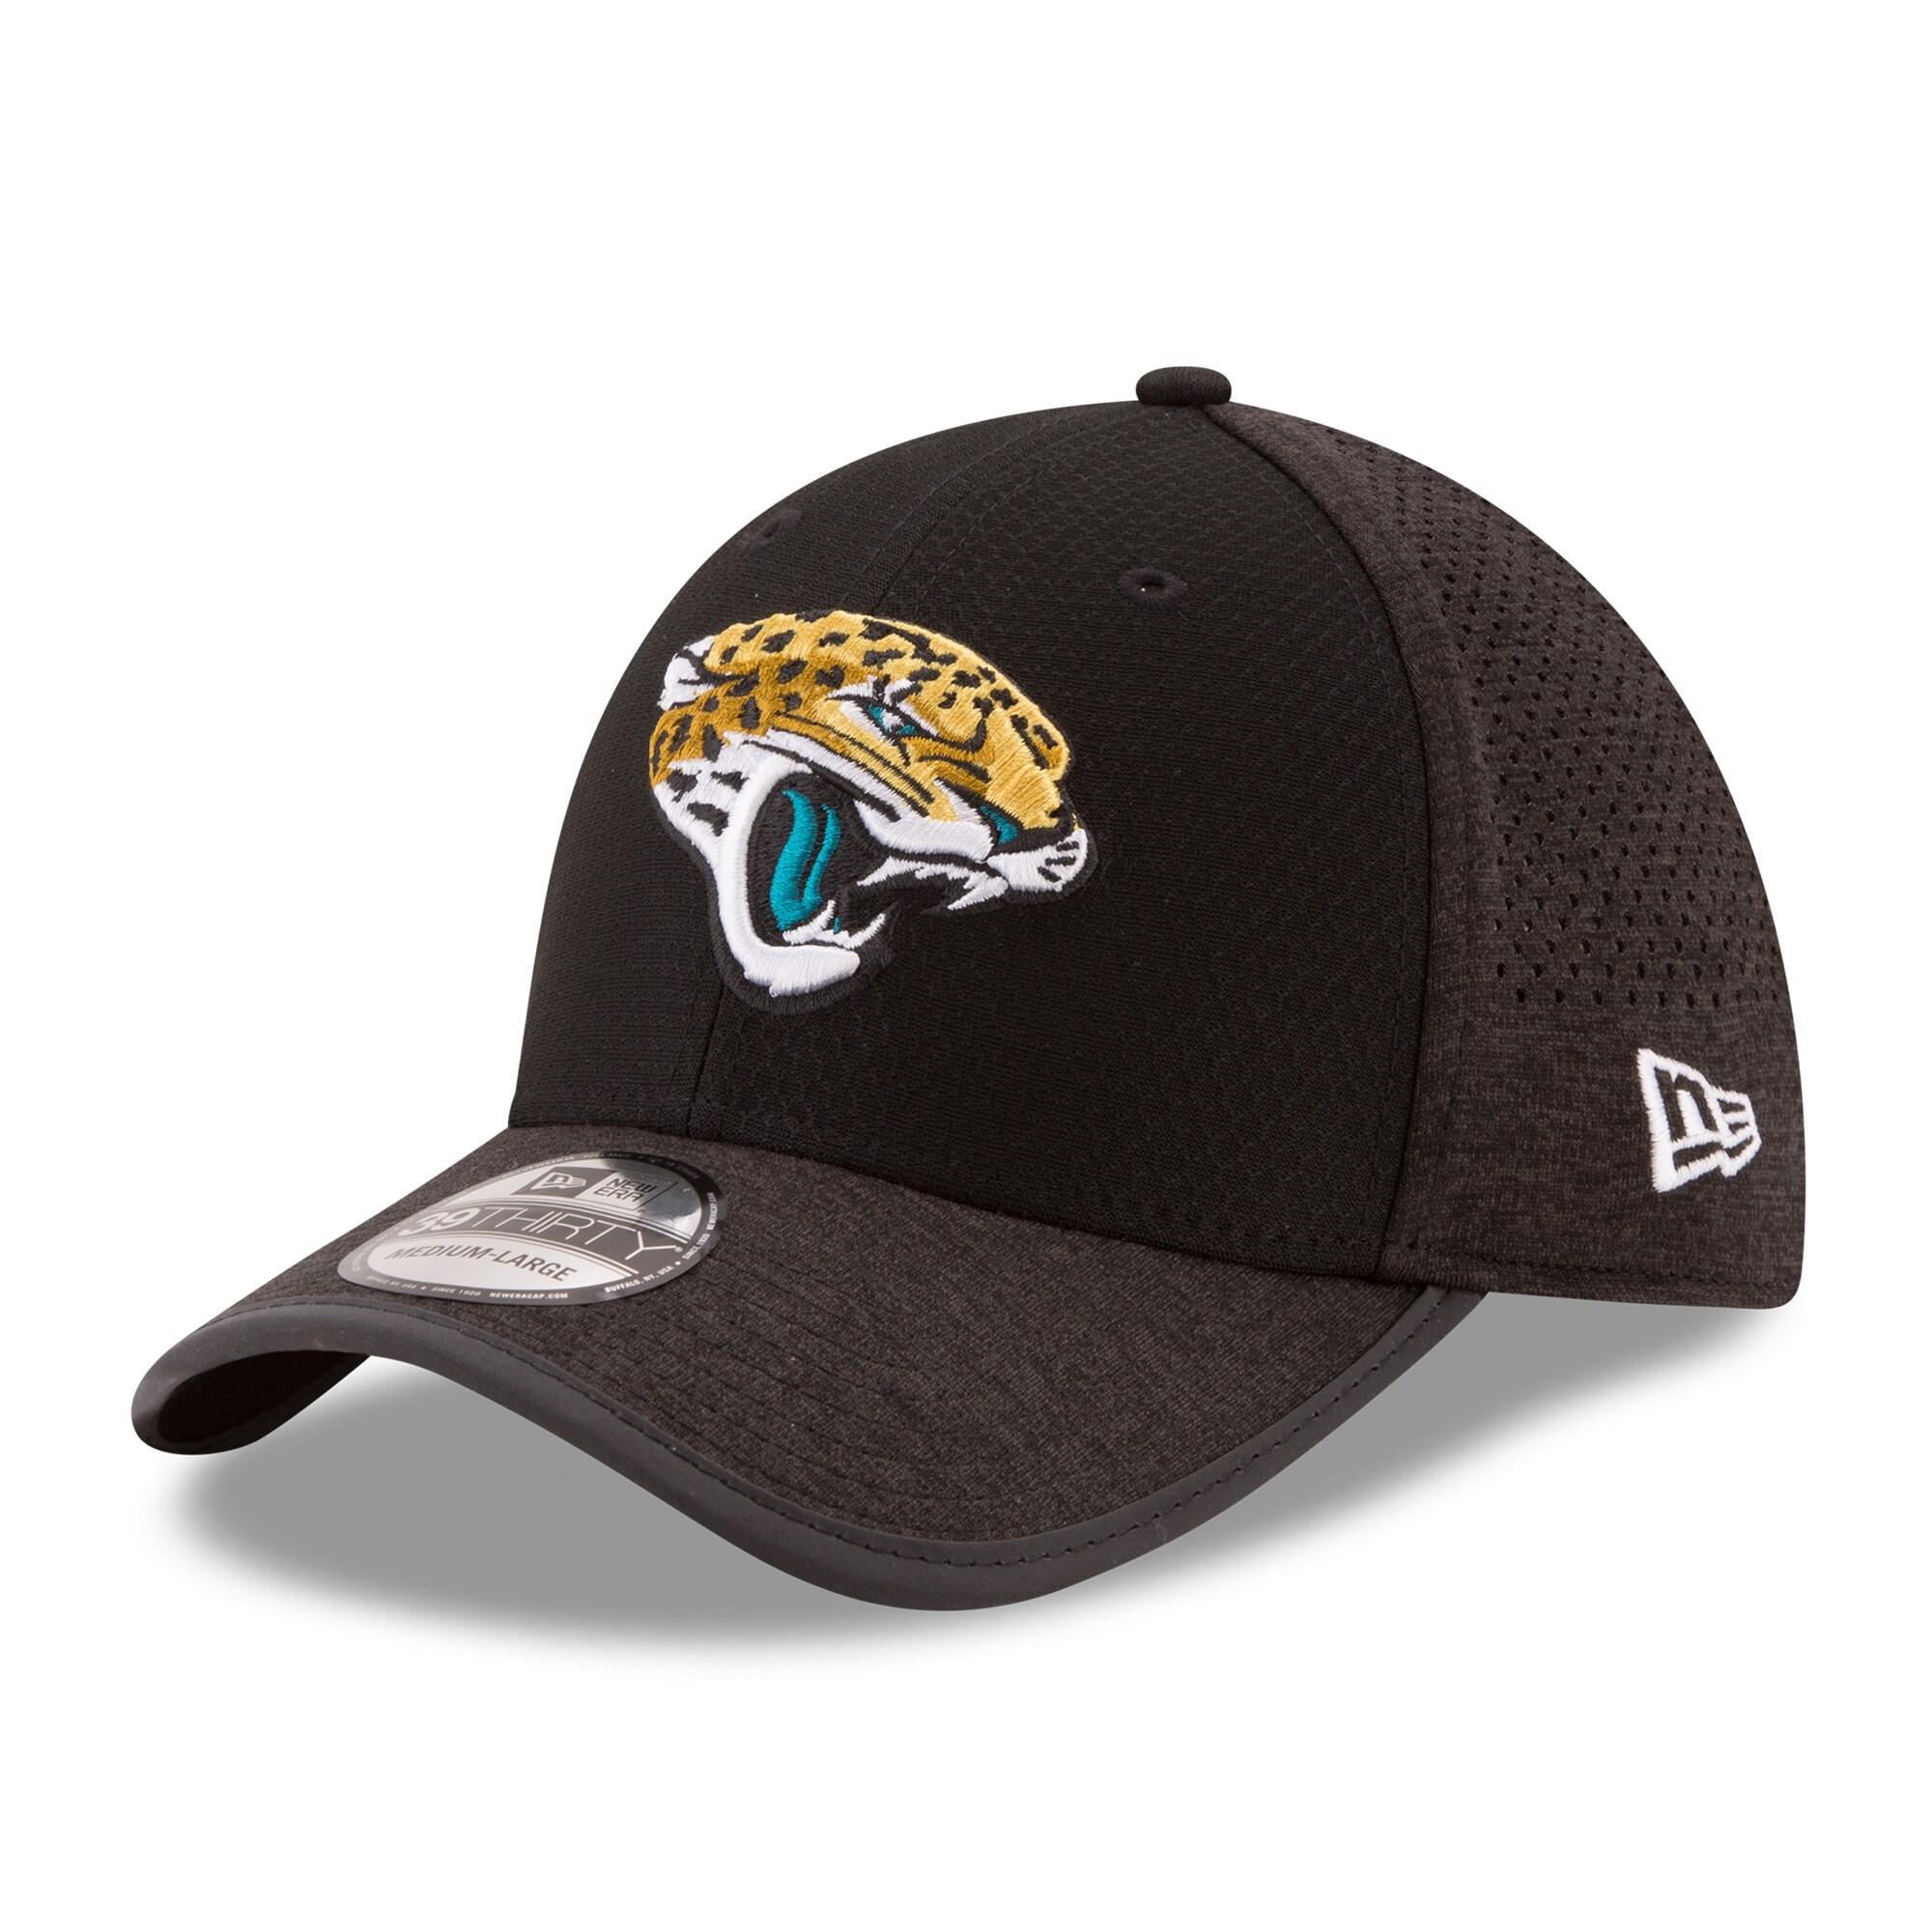 Jacksonville Jaguars New Era 2017 Training Camp Official 39THIRTY Flex Hat - Black